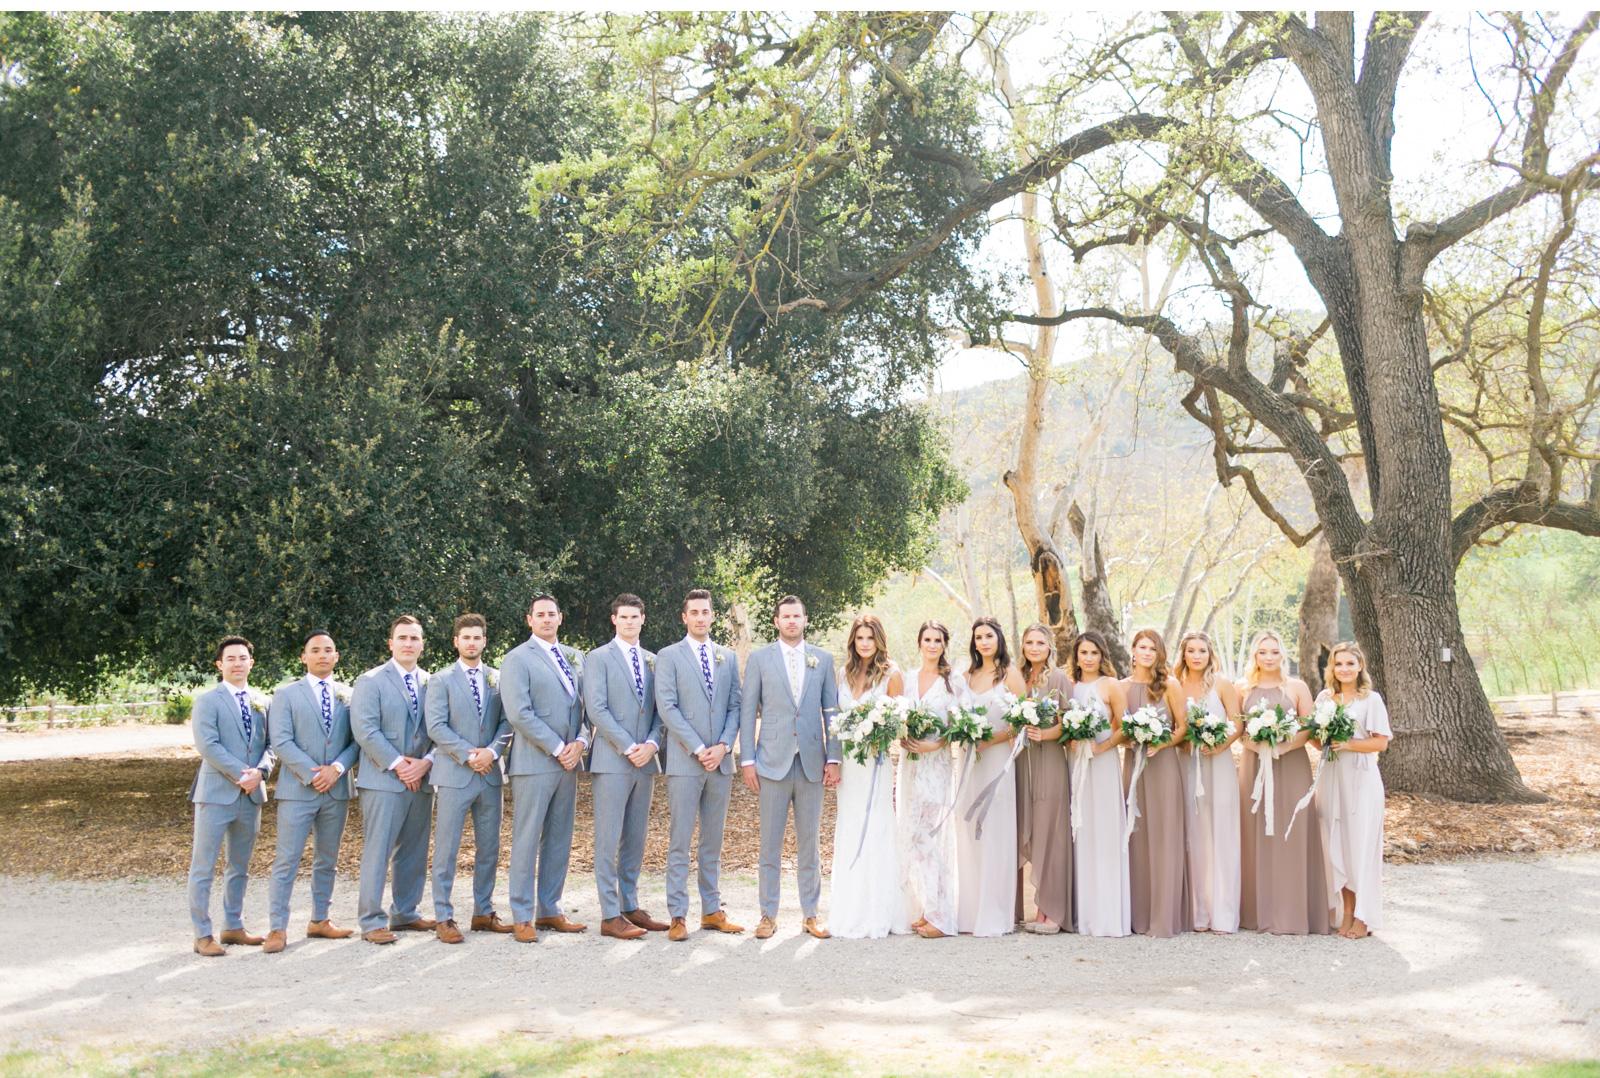 Malibu-Wedding-Photographer-Saddlerock-Ranch-Triunfo-Creek-Style-Me-Pretty_14.jpg